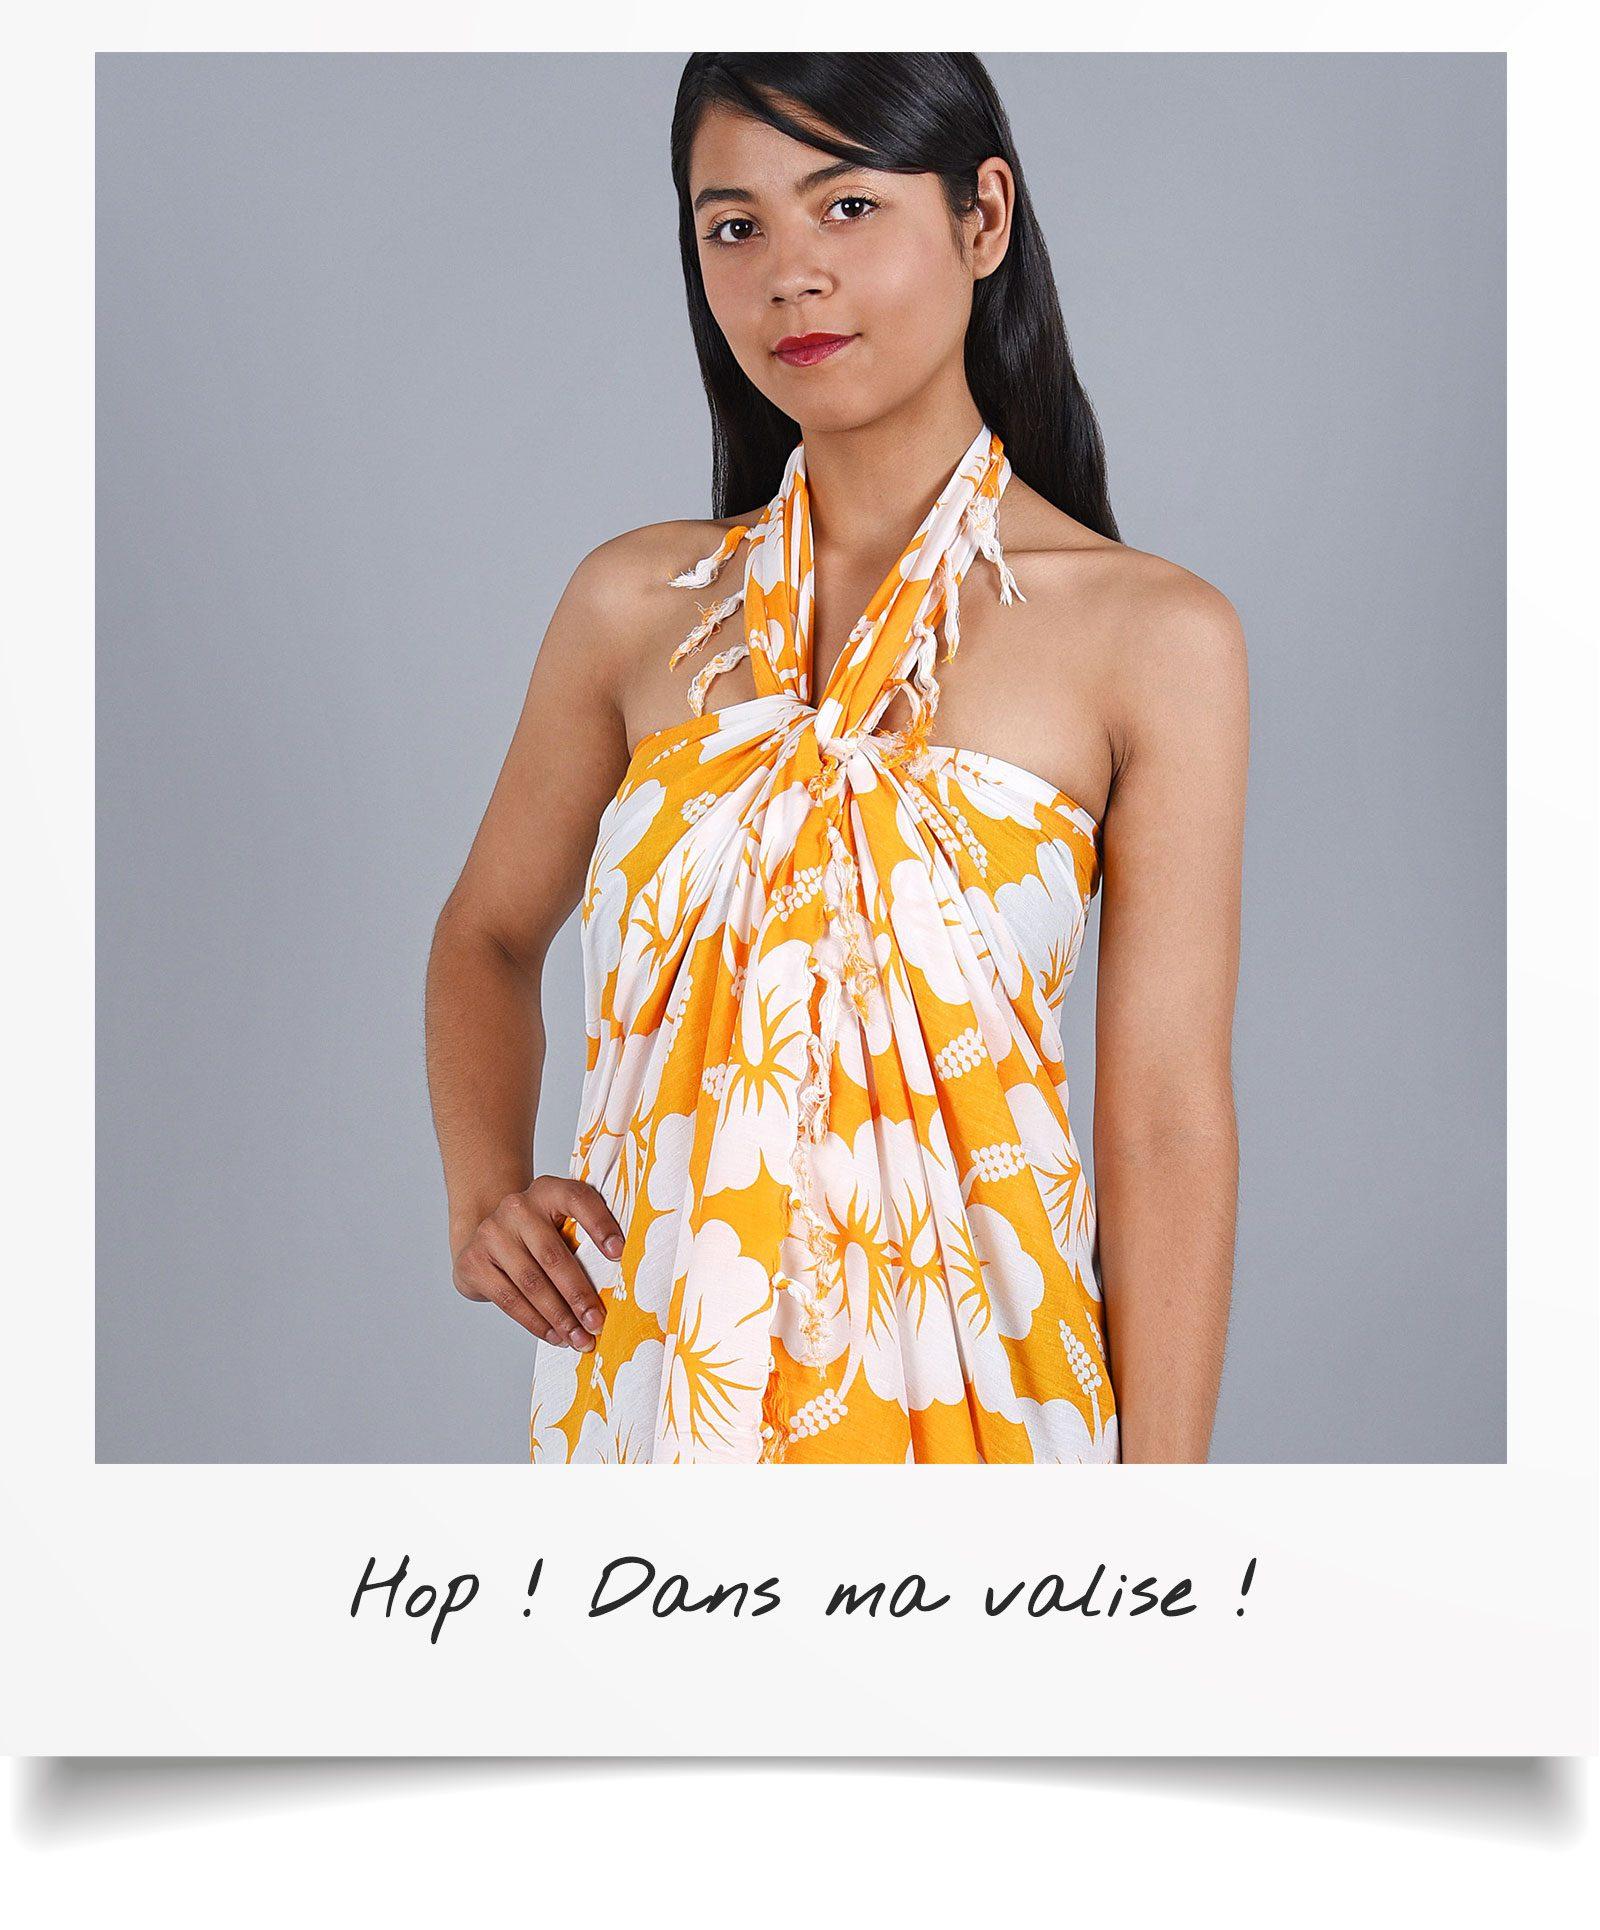 http://lookbook.allee-du-foulard.fr/wp-content/uploads/2018/06/0680-ADF-Accessoires-de-mode-LB-Soldes-Ete-pareo-hibiscus-1600x1930.jpg